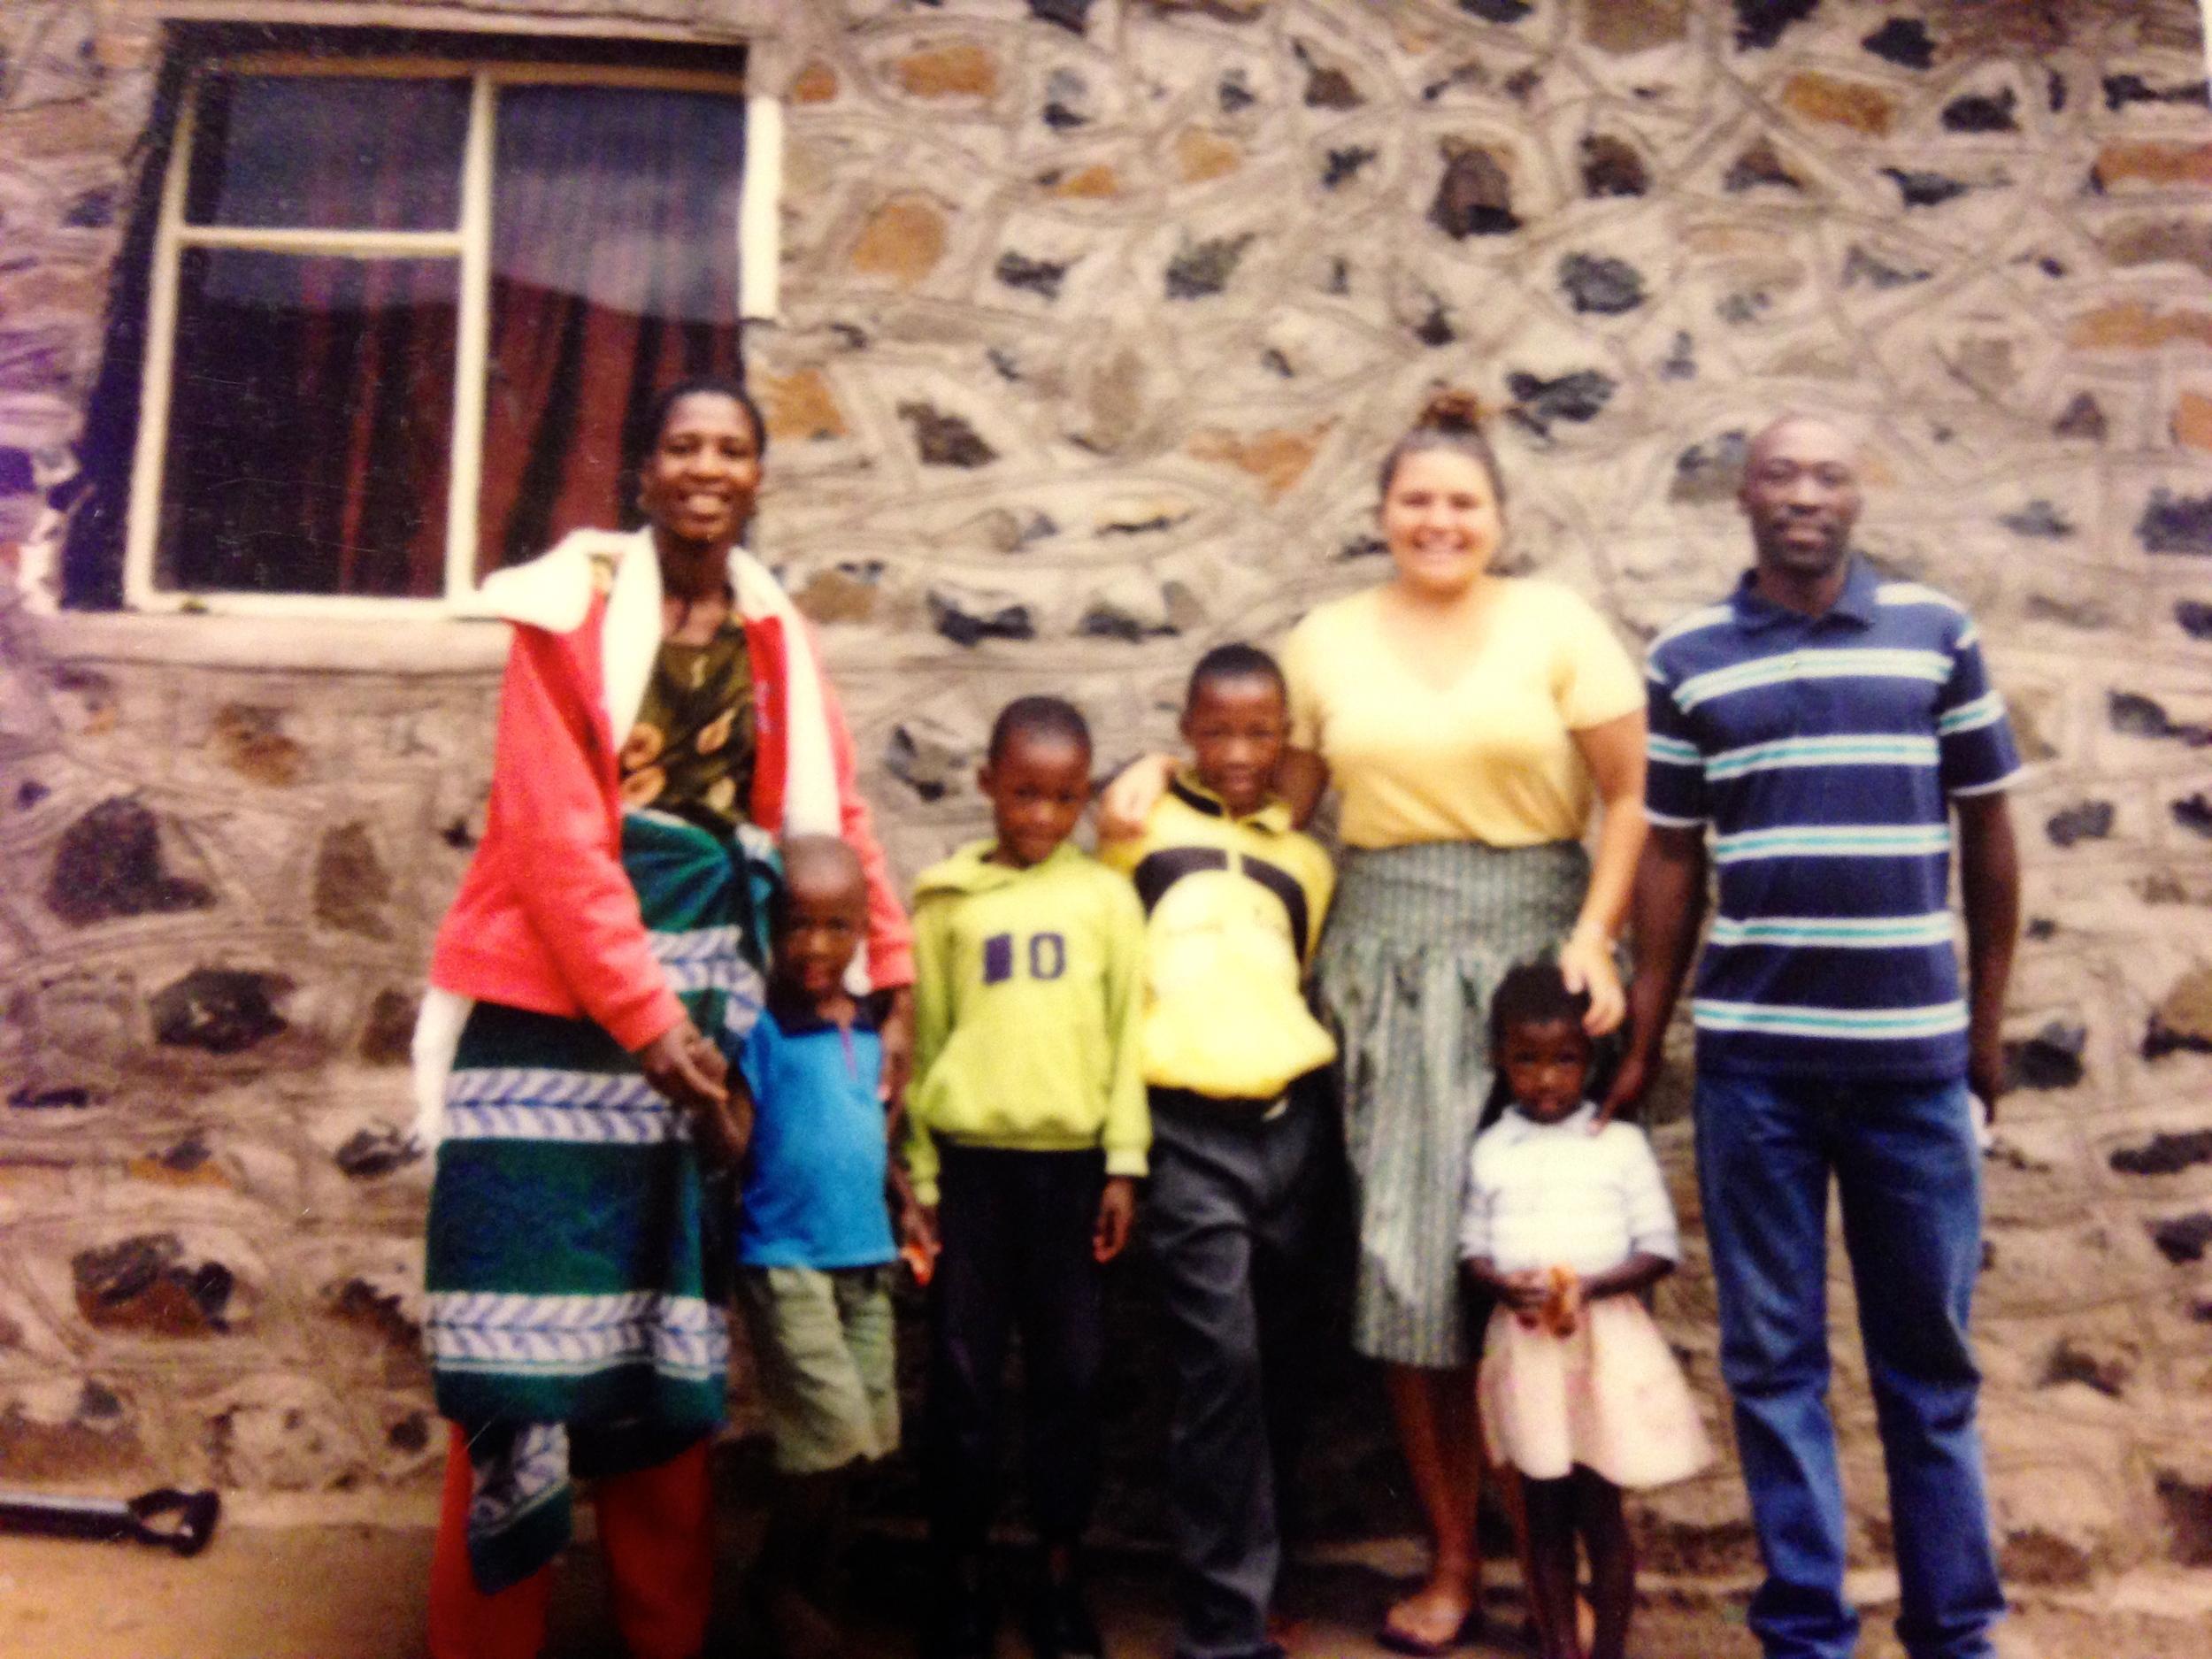 The Ramone family. Left to right: Mme Ma Karabelo; Rorisang; Moeko; Karabelo; Relebohile (Kara); Refuea; Ntate Lerato.